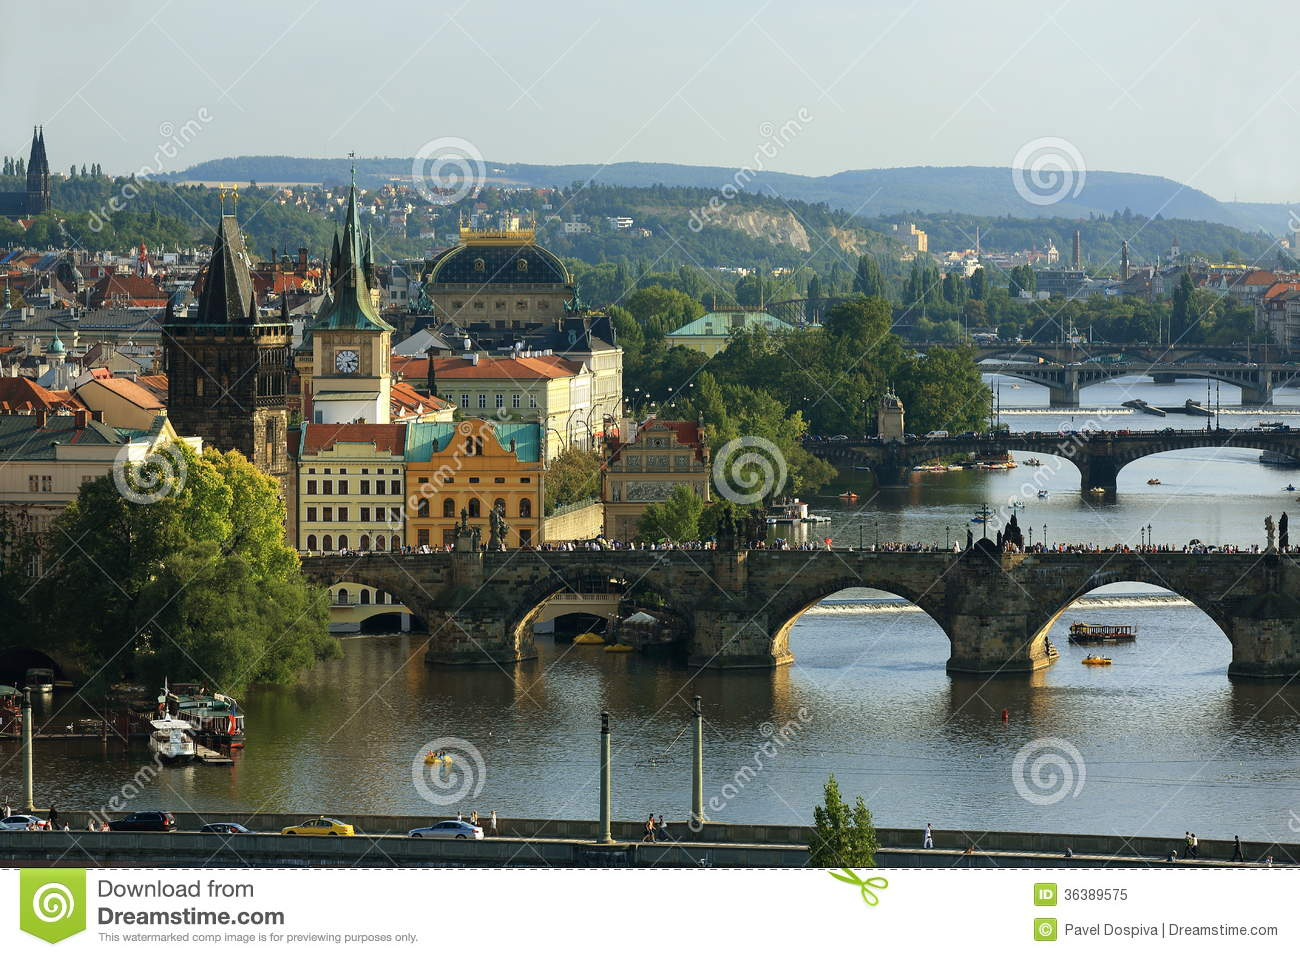 Moldau And Bridges, Charles Bridge, Panorama Of The Old Town.